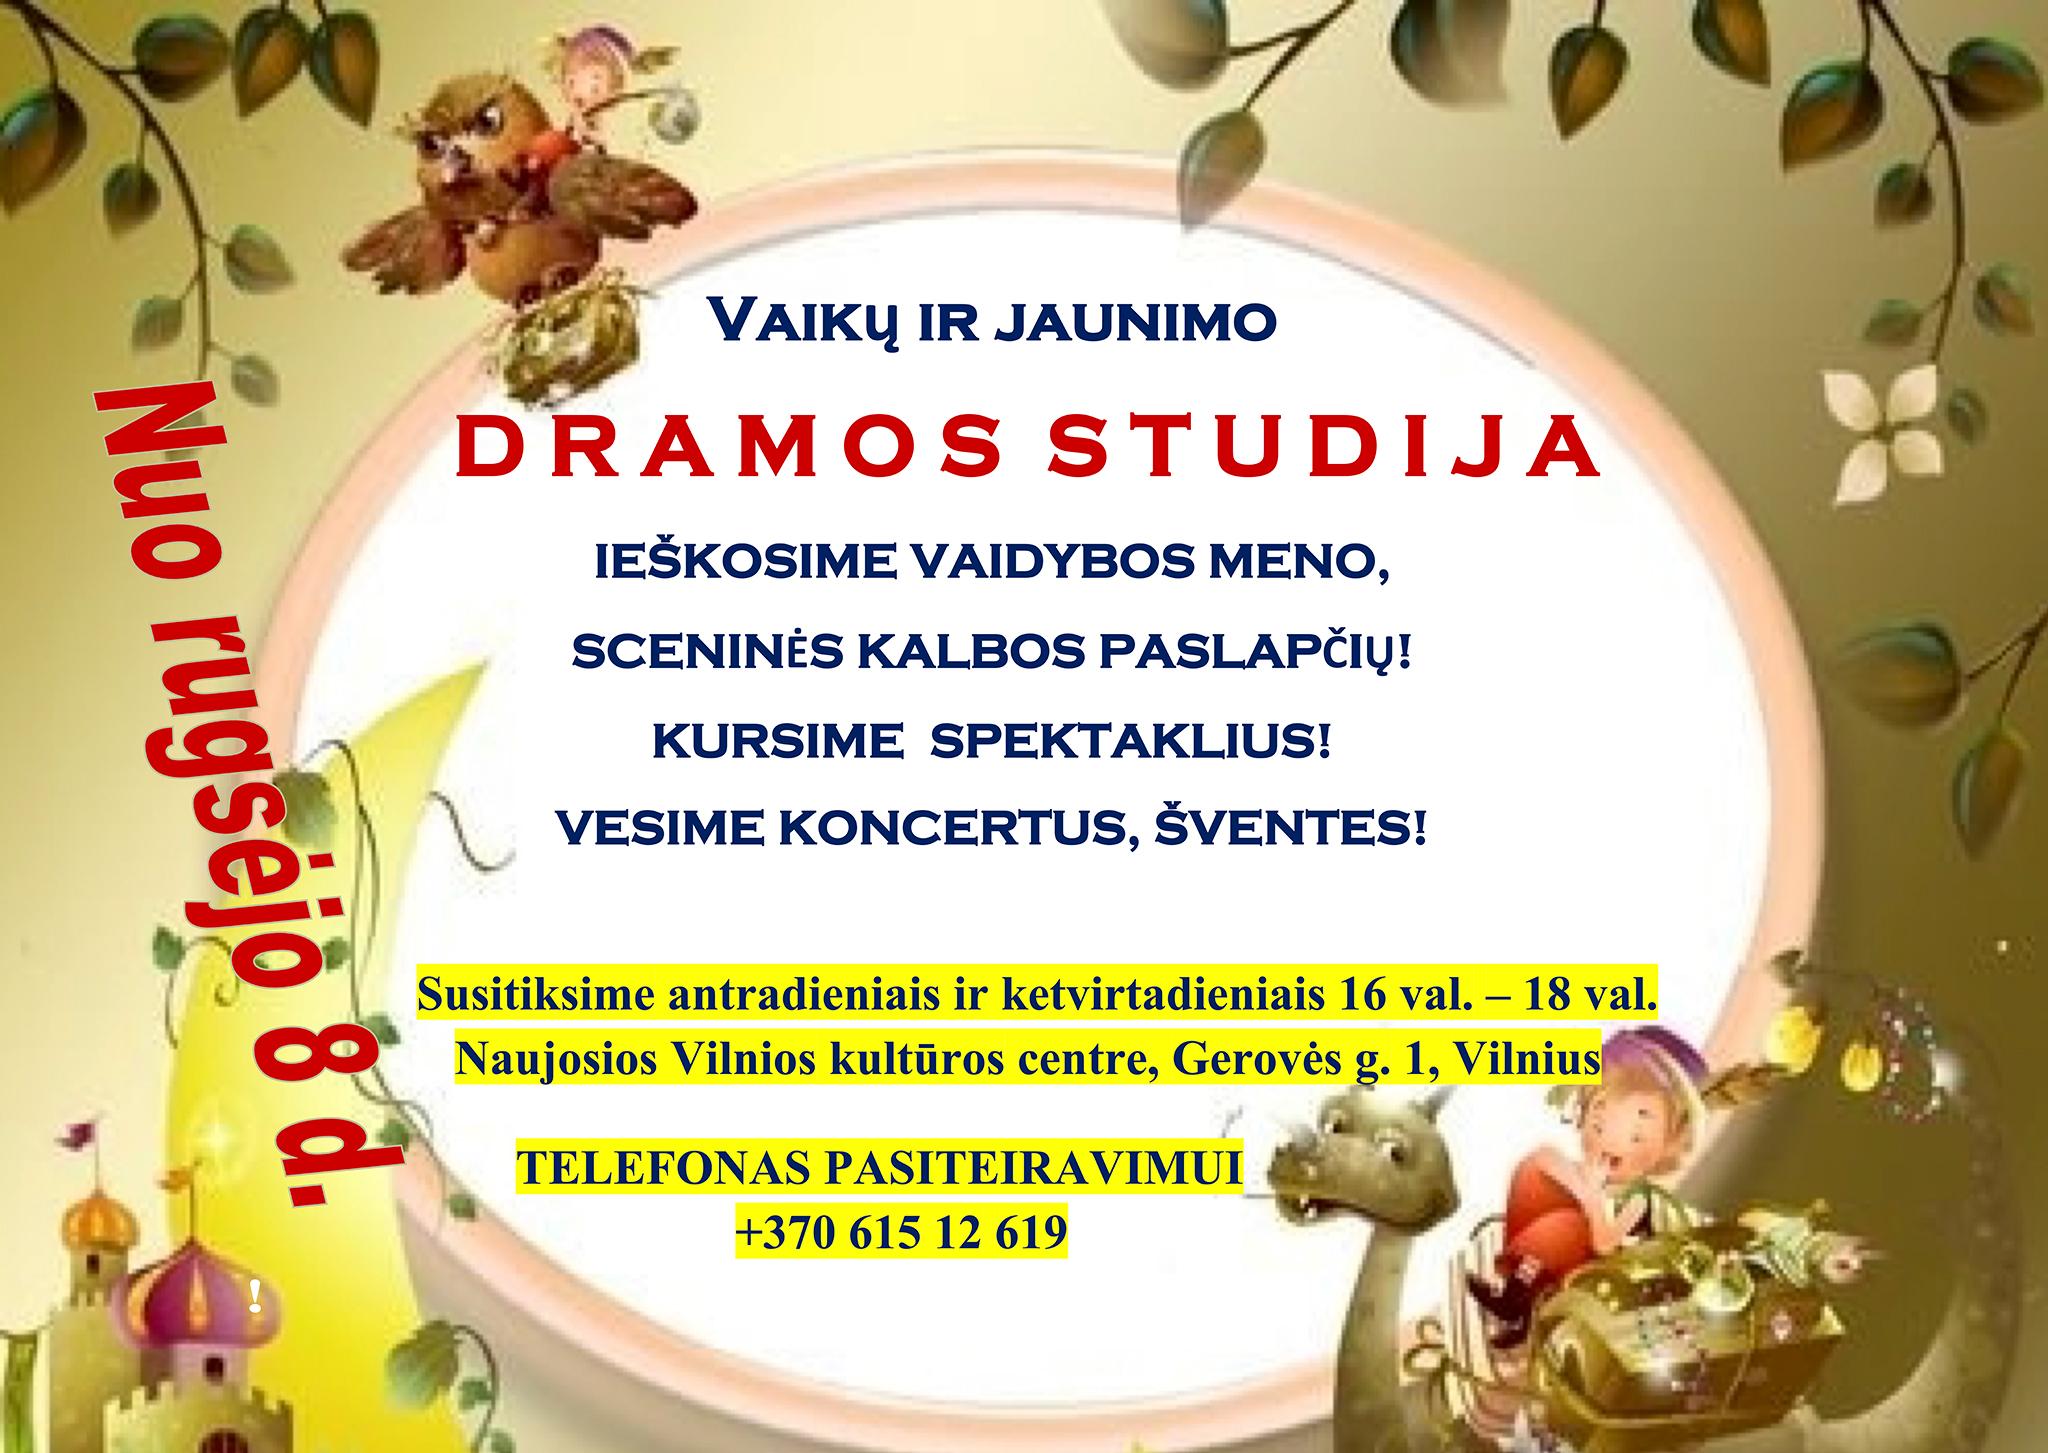 Dramos studija